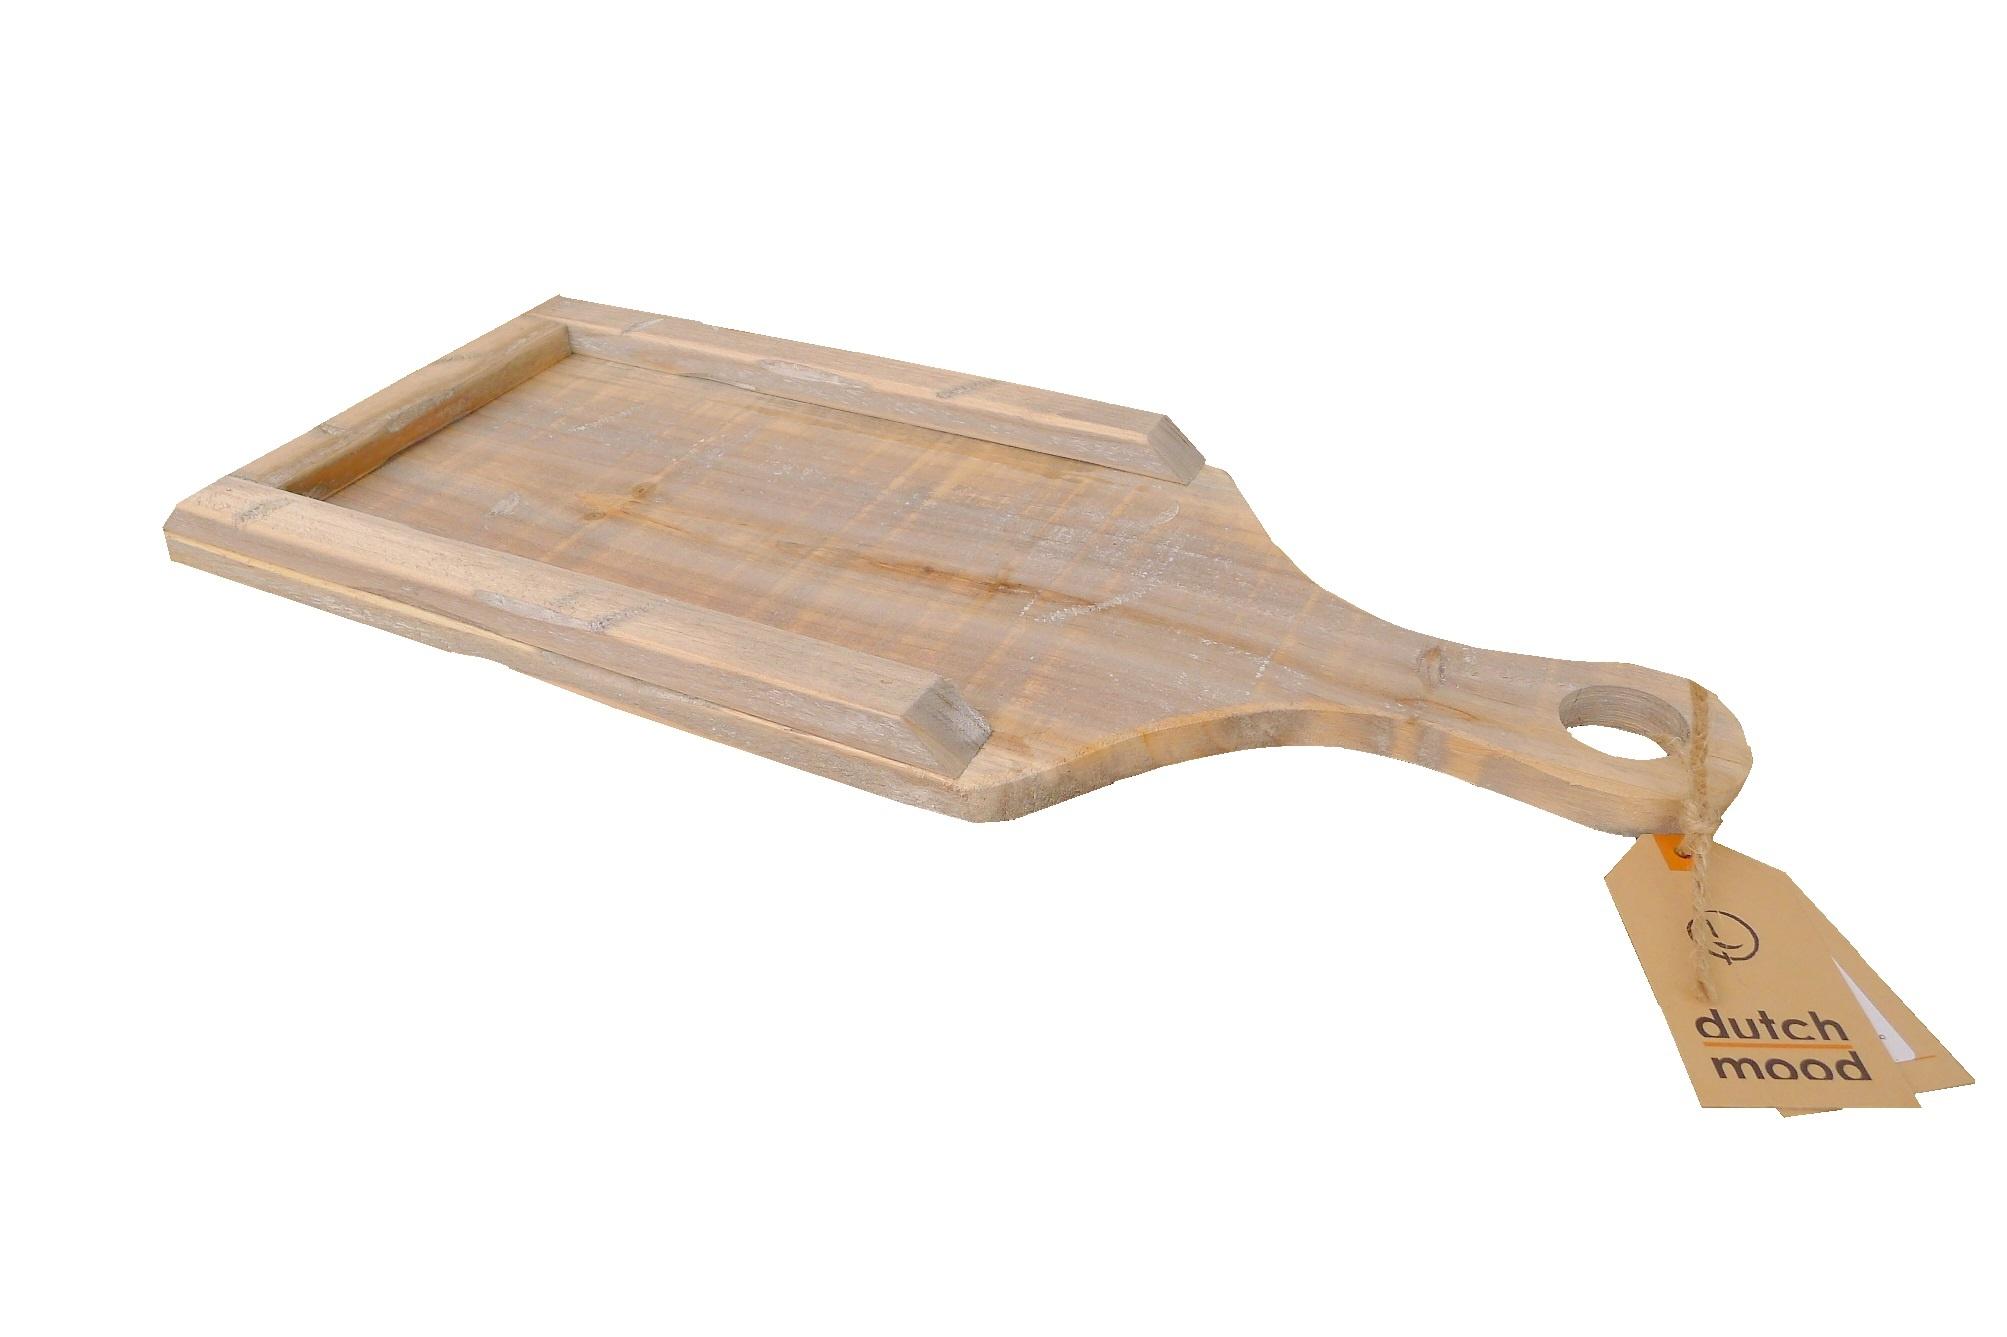 tray old dutchc sandwitch 44-1